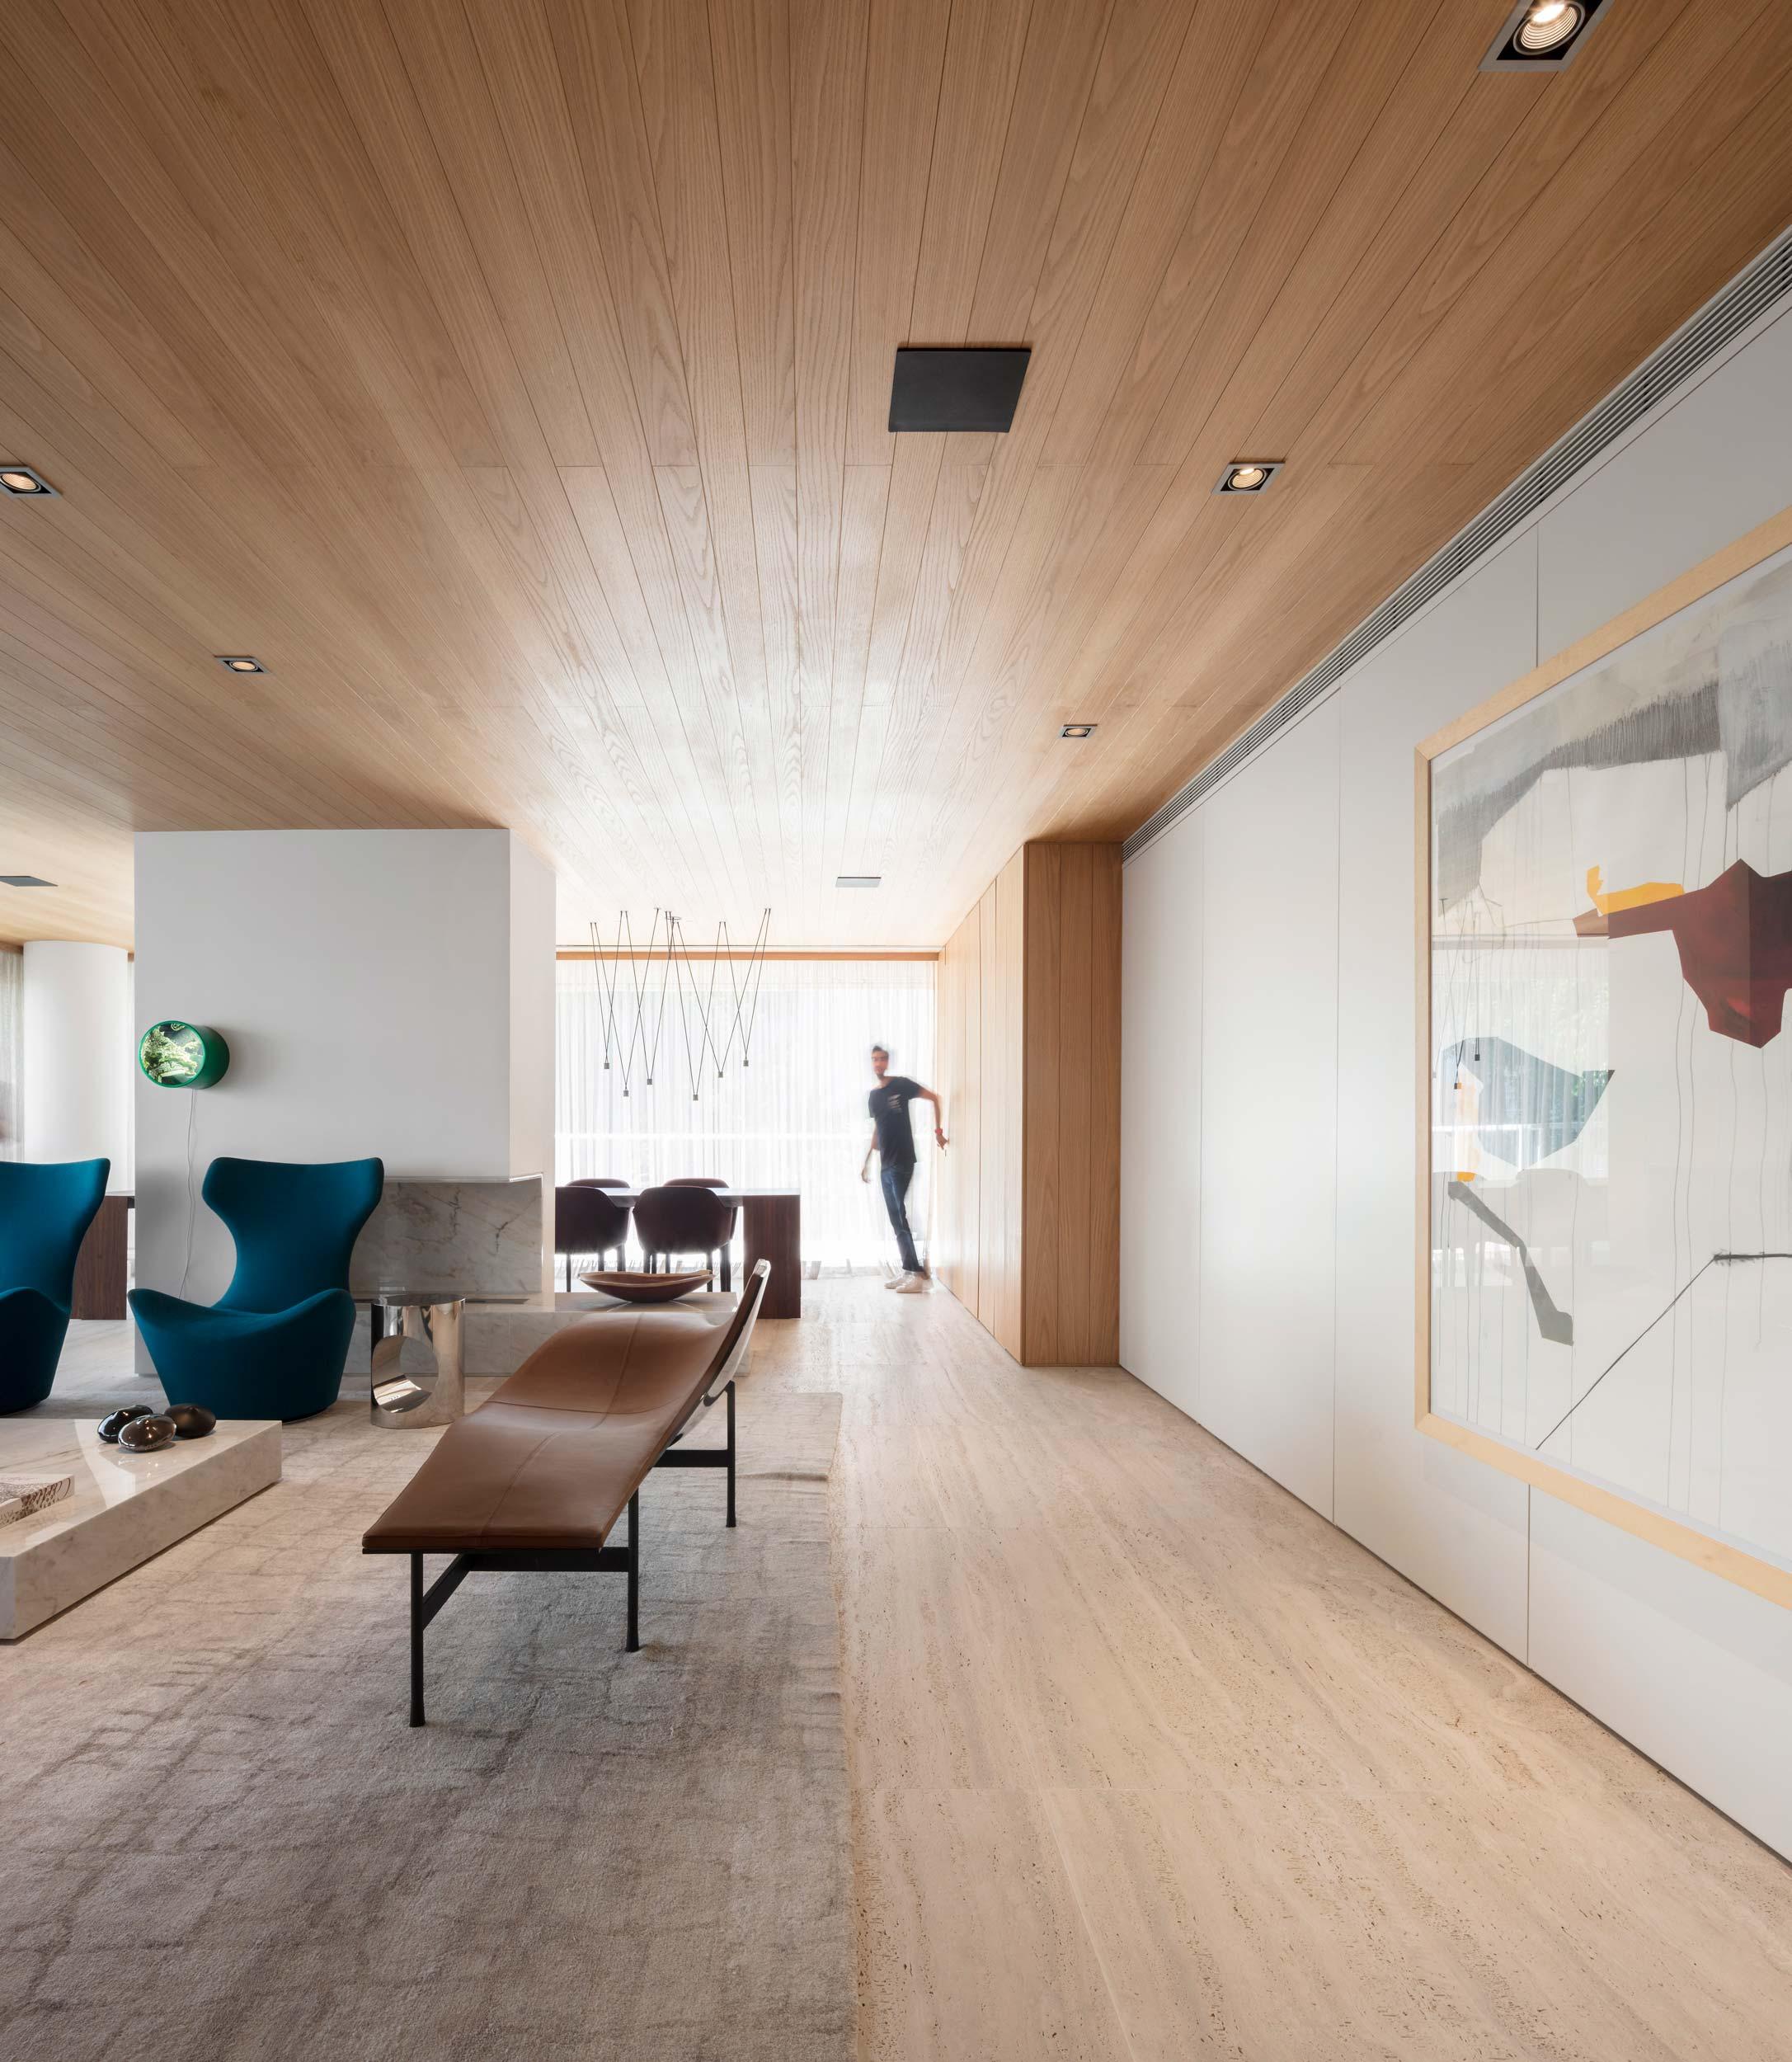 projeto-eretz-fernanda-marques-arquiteta-4.JPG